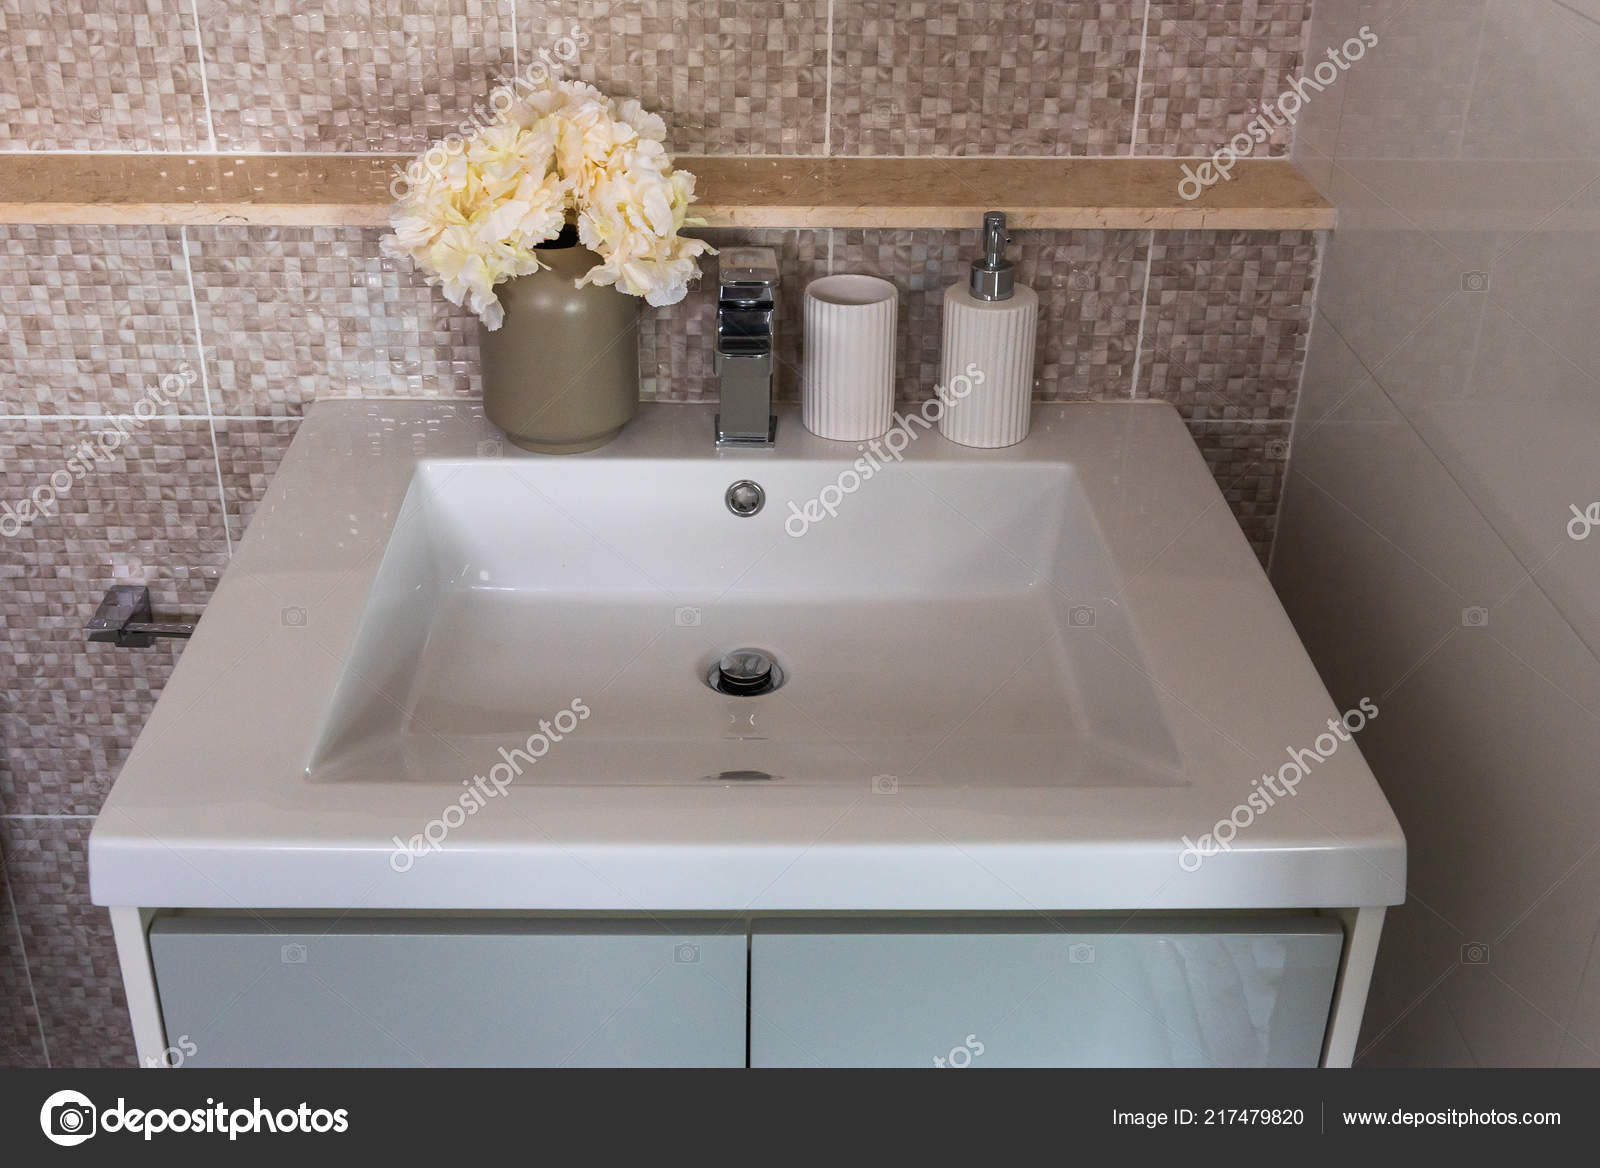 Moderne badkamer met moderne wastafel interieur decoratie concept